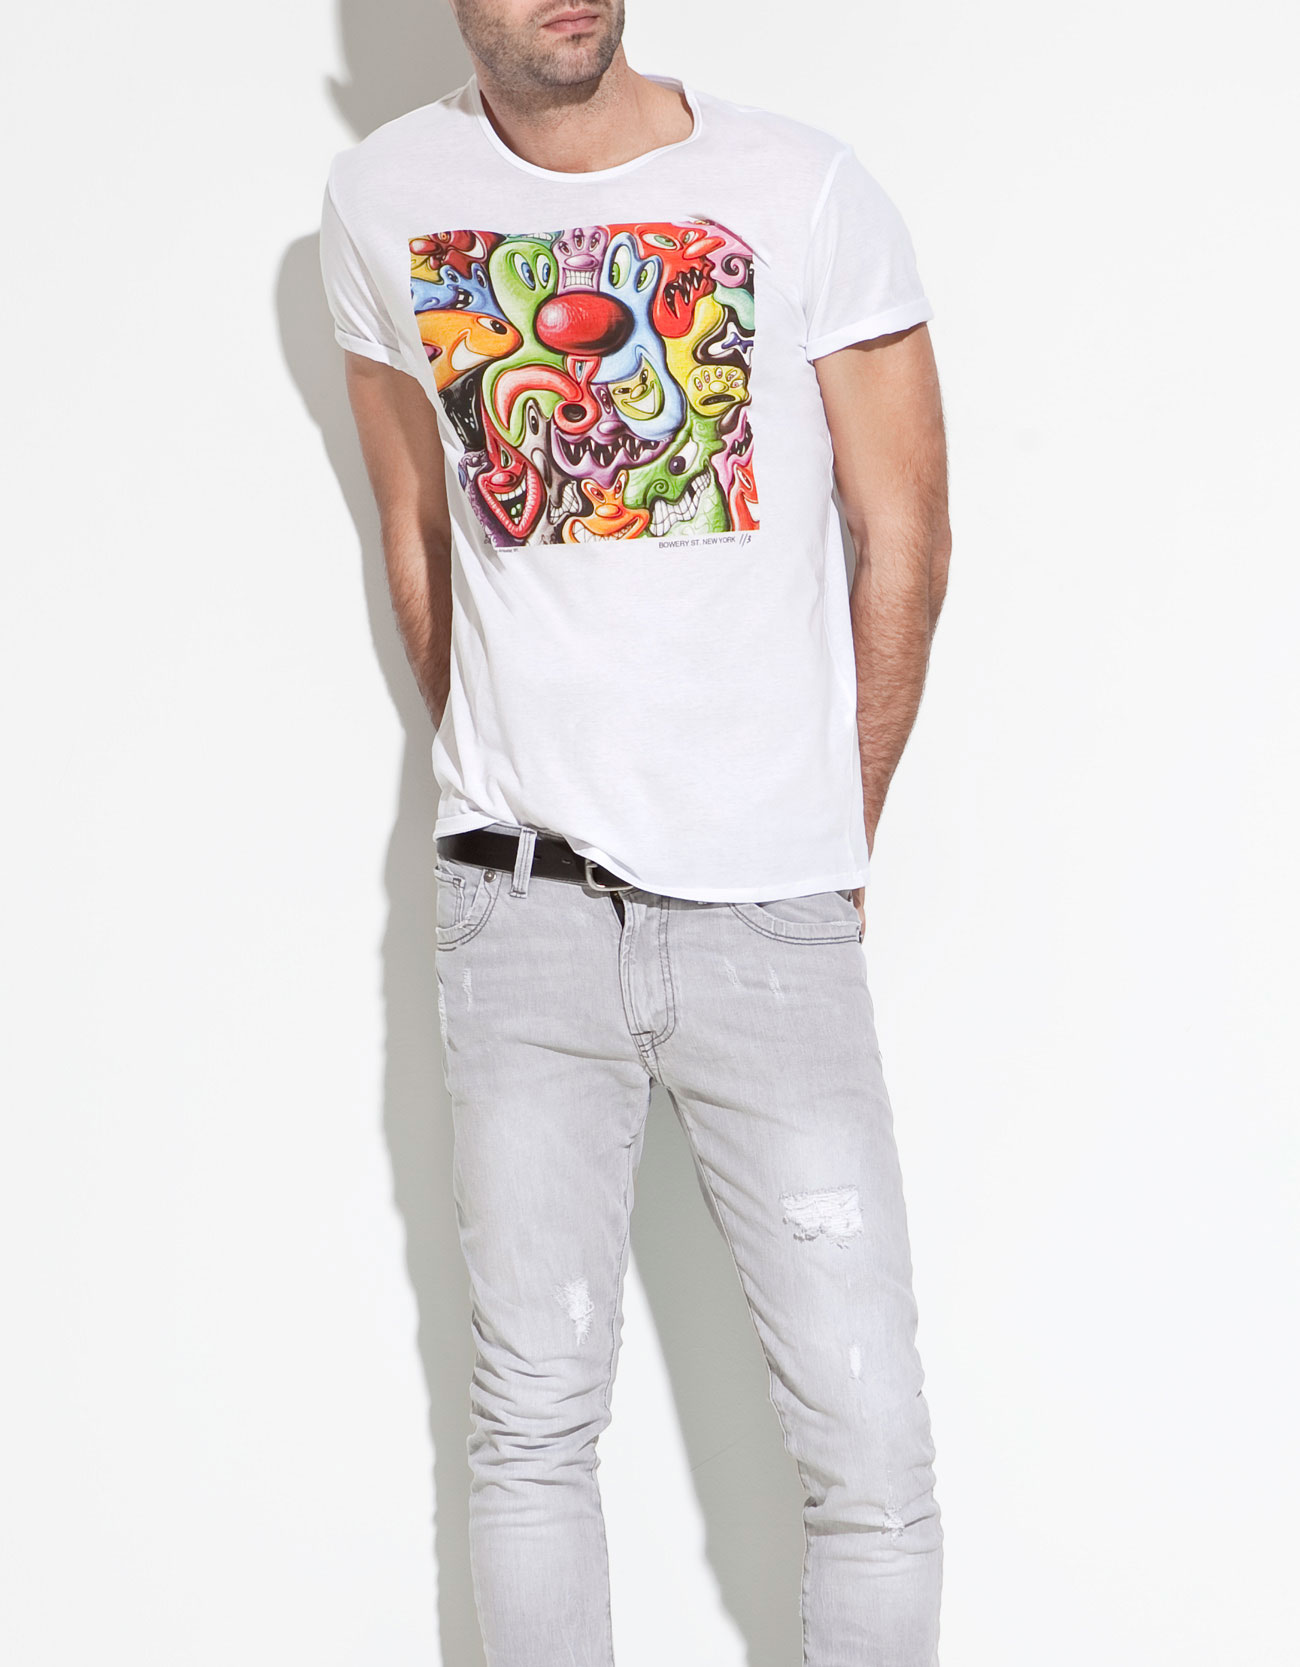 zara-white-kenny-scharf-t-shirt-product-1-3007940-593586371.jpeg